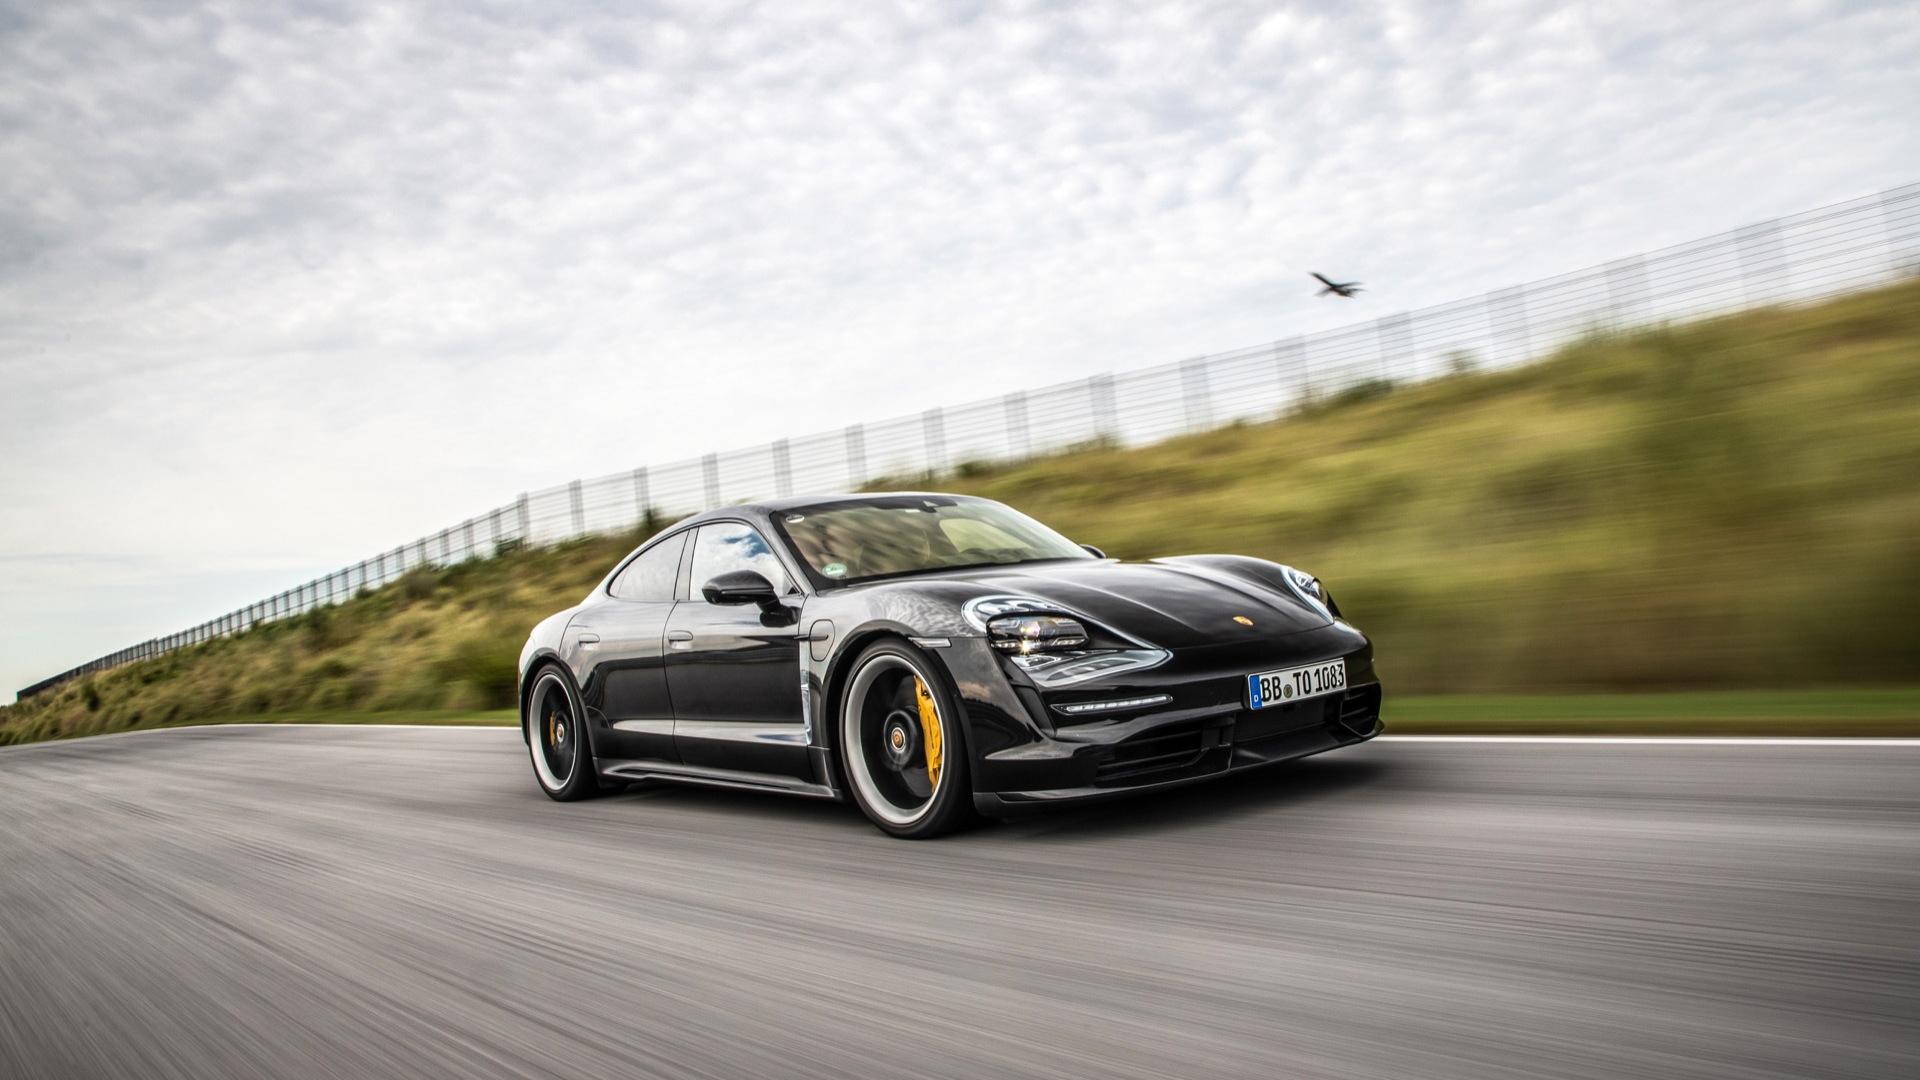 2020 Porsche Taycan preview